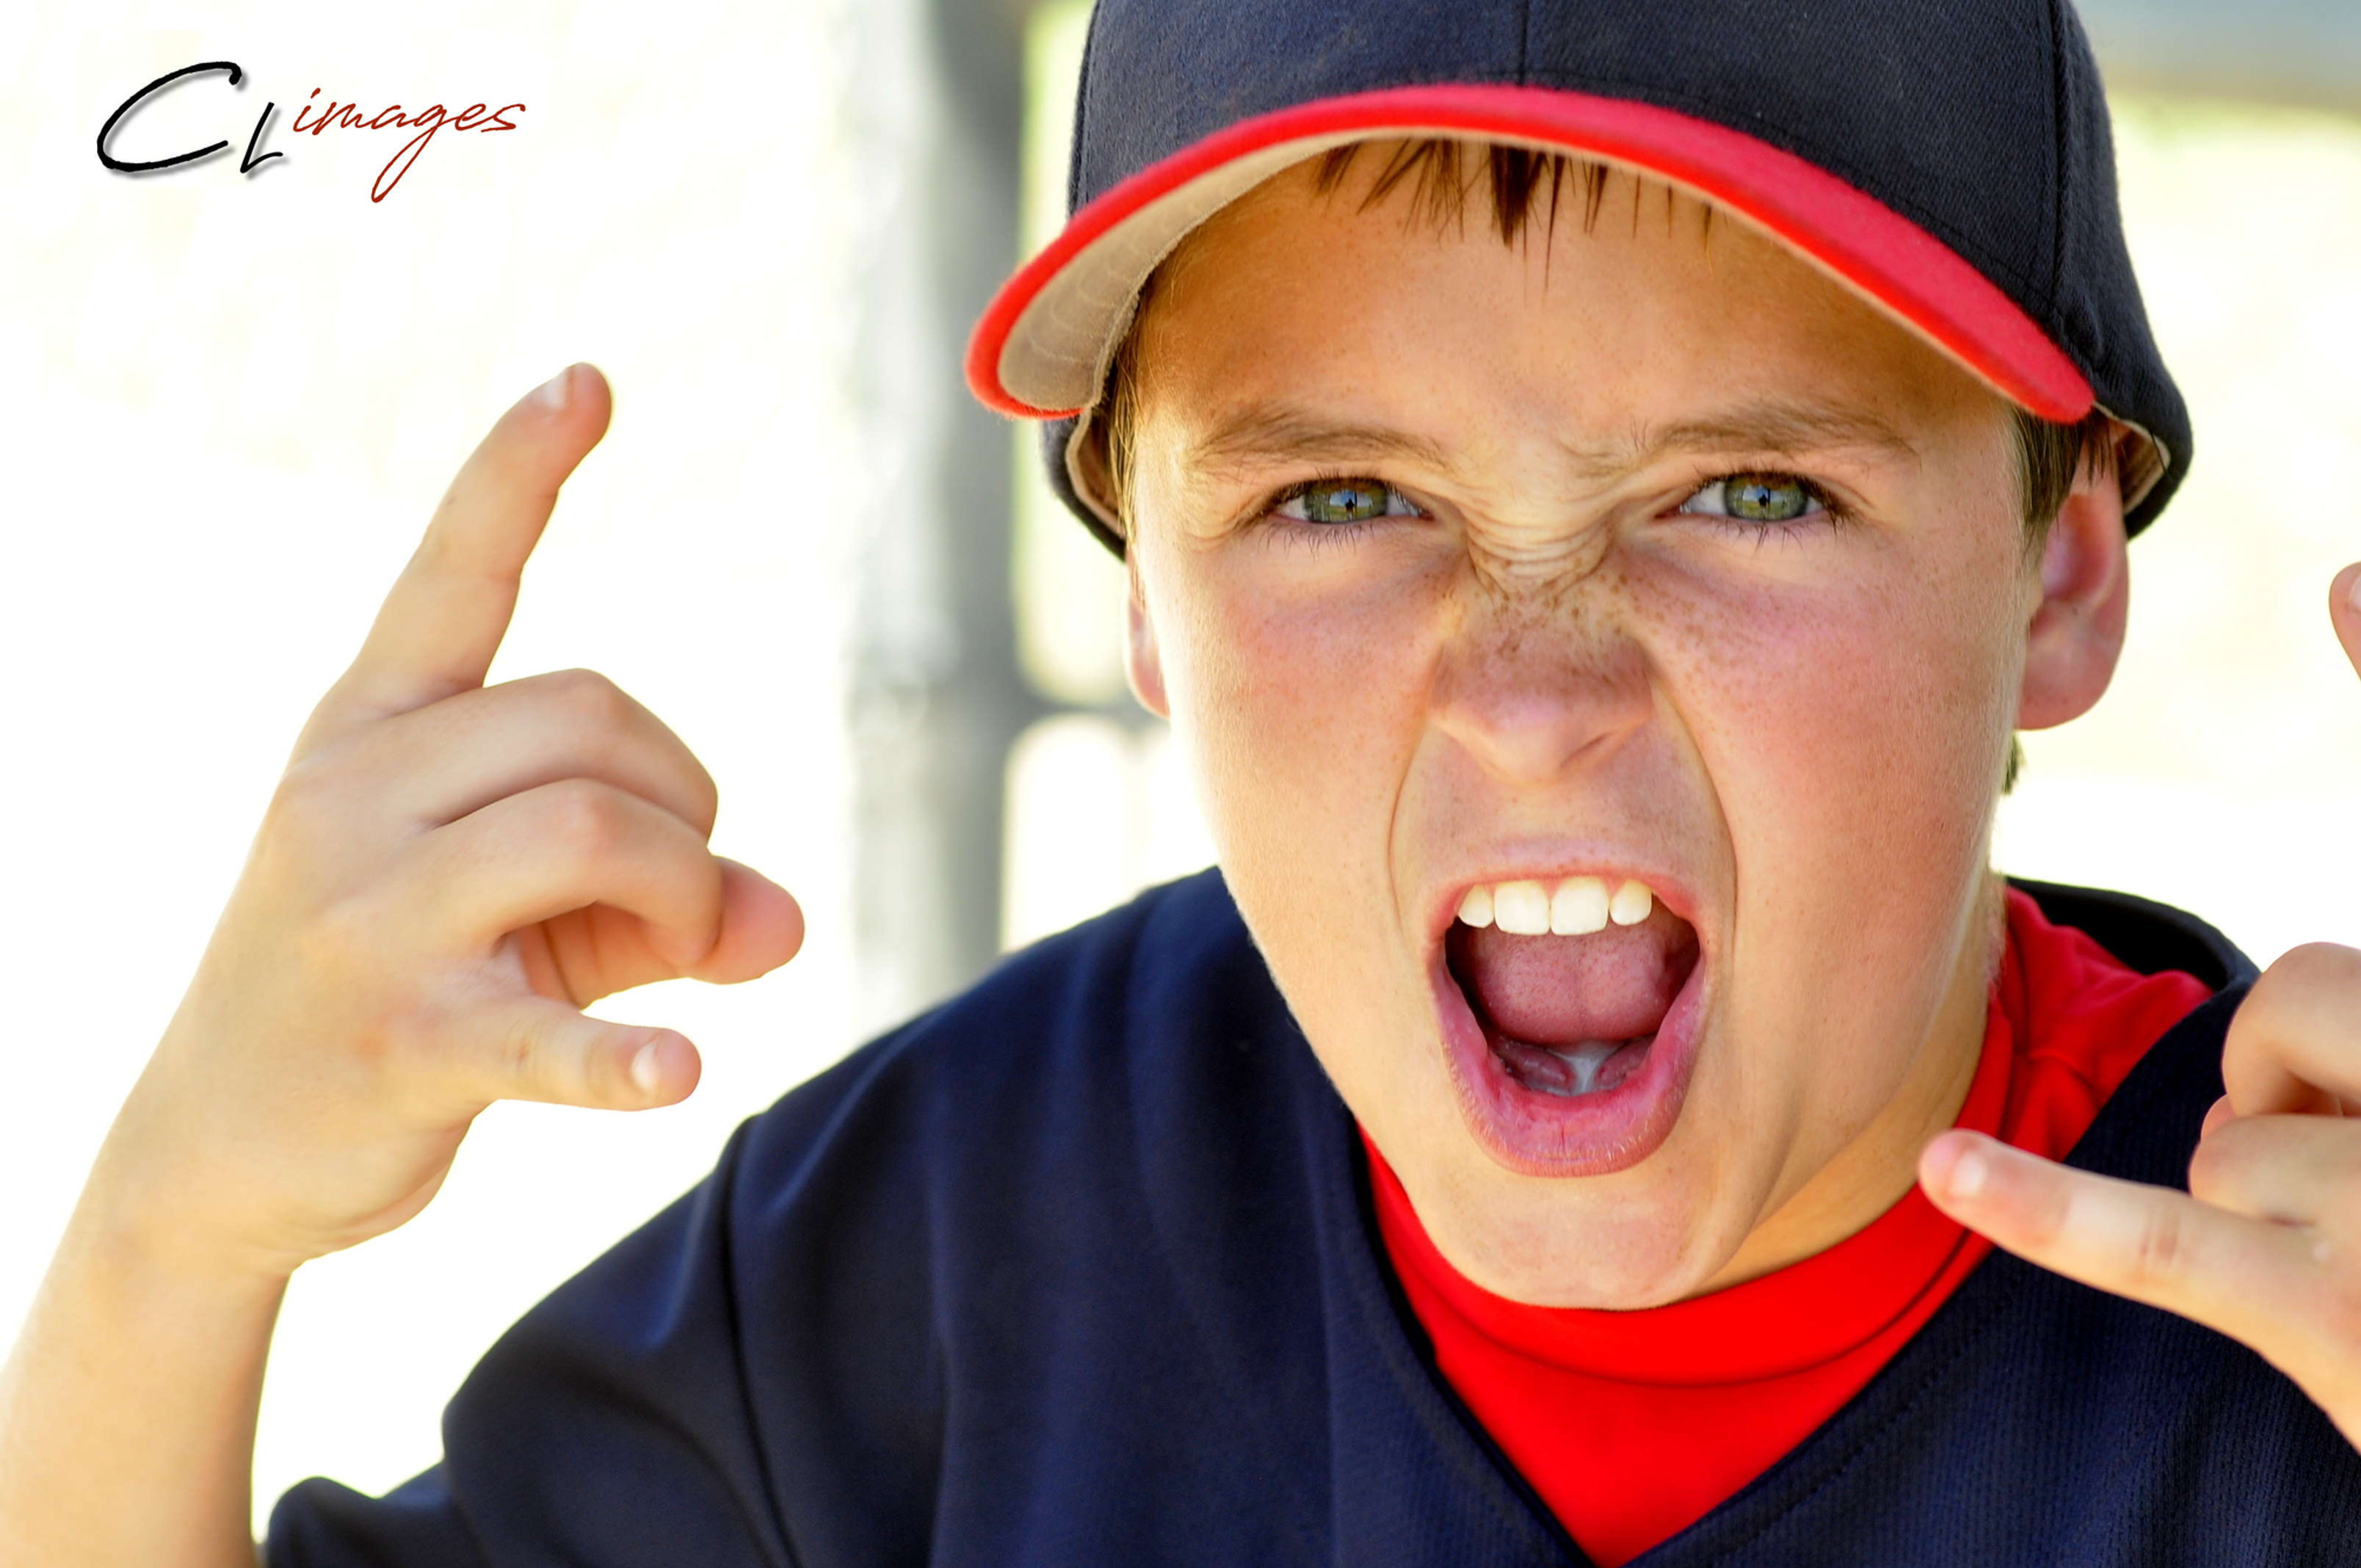 Madd Sports Photography